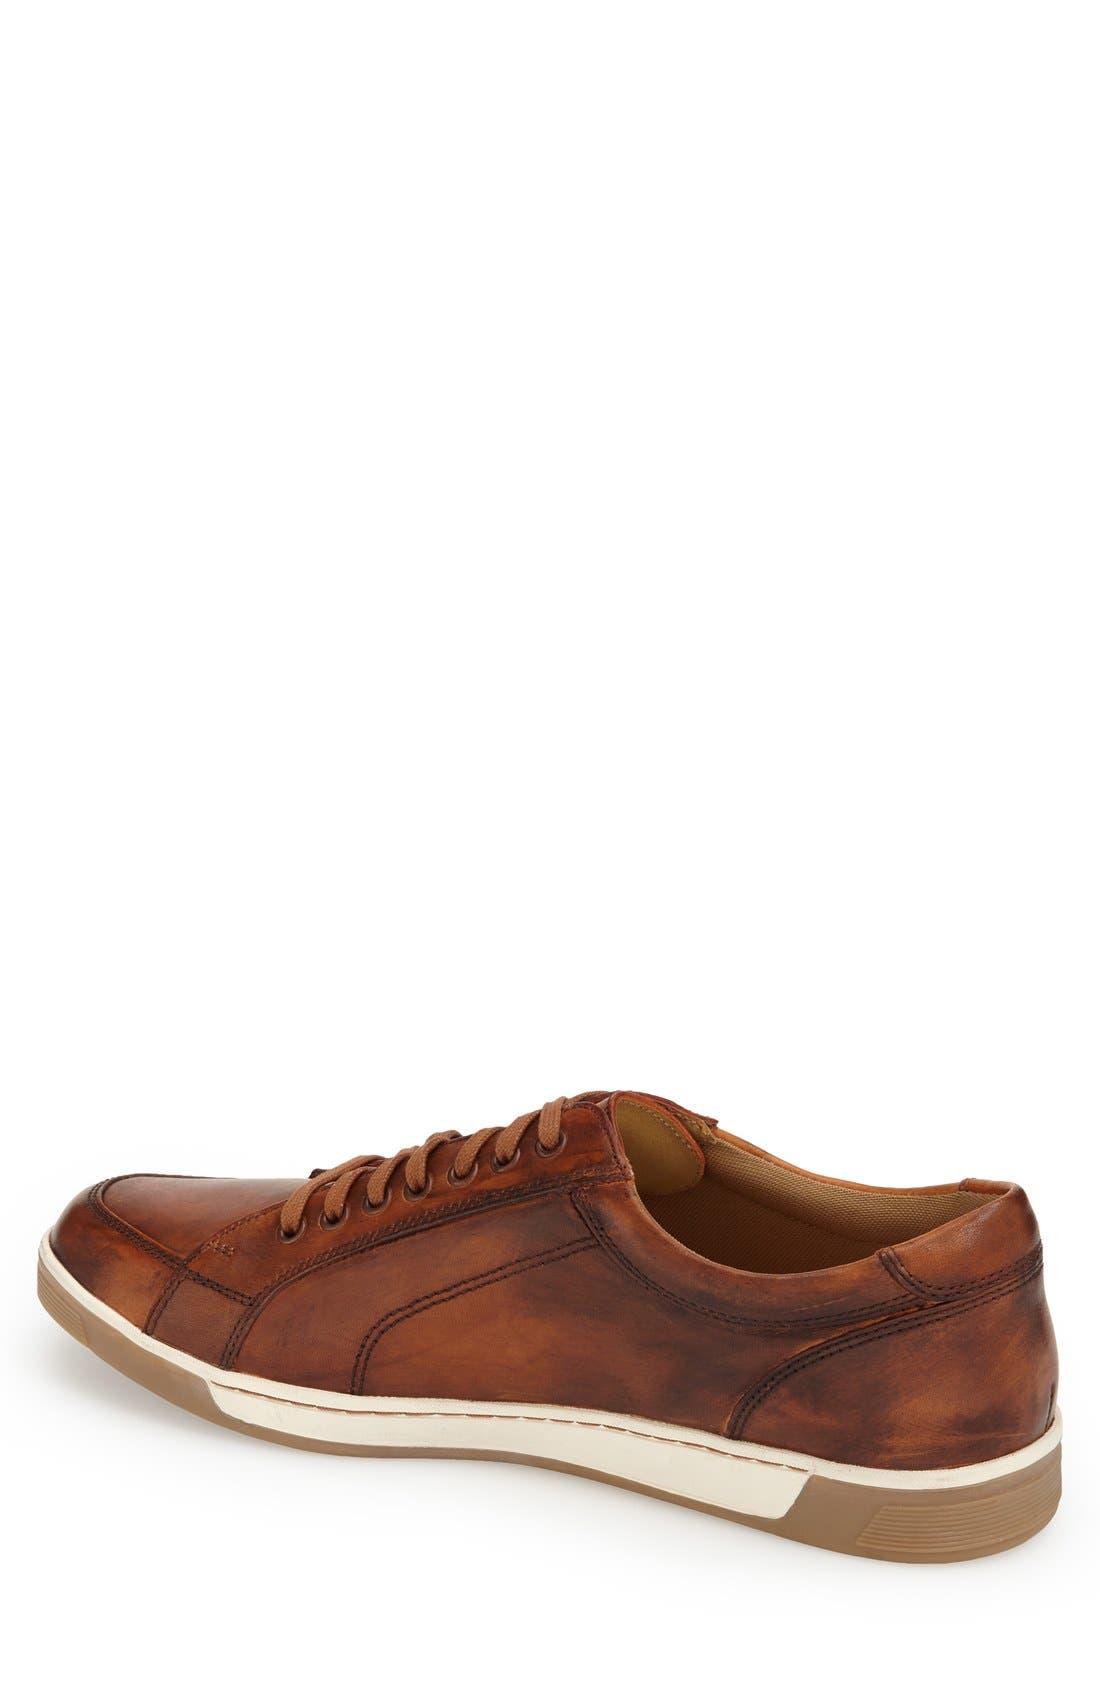 'Vartan Sport Oxford' Sneaker,                             Alternate thumbnail 41, color,